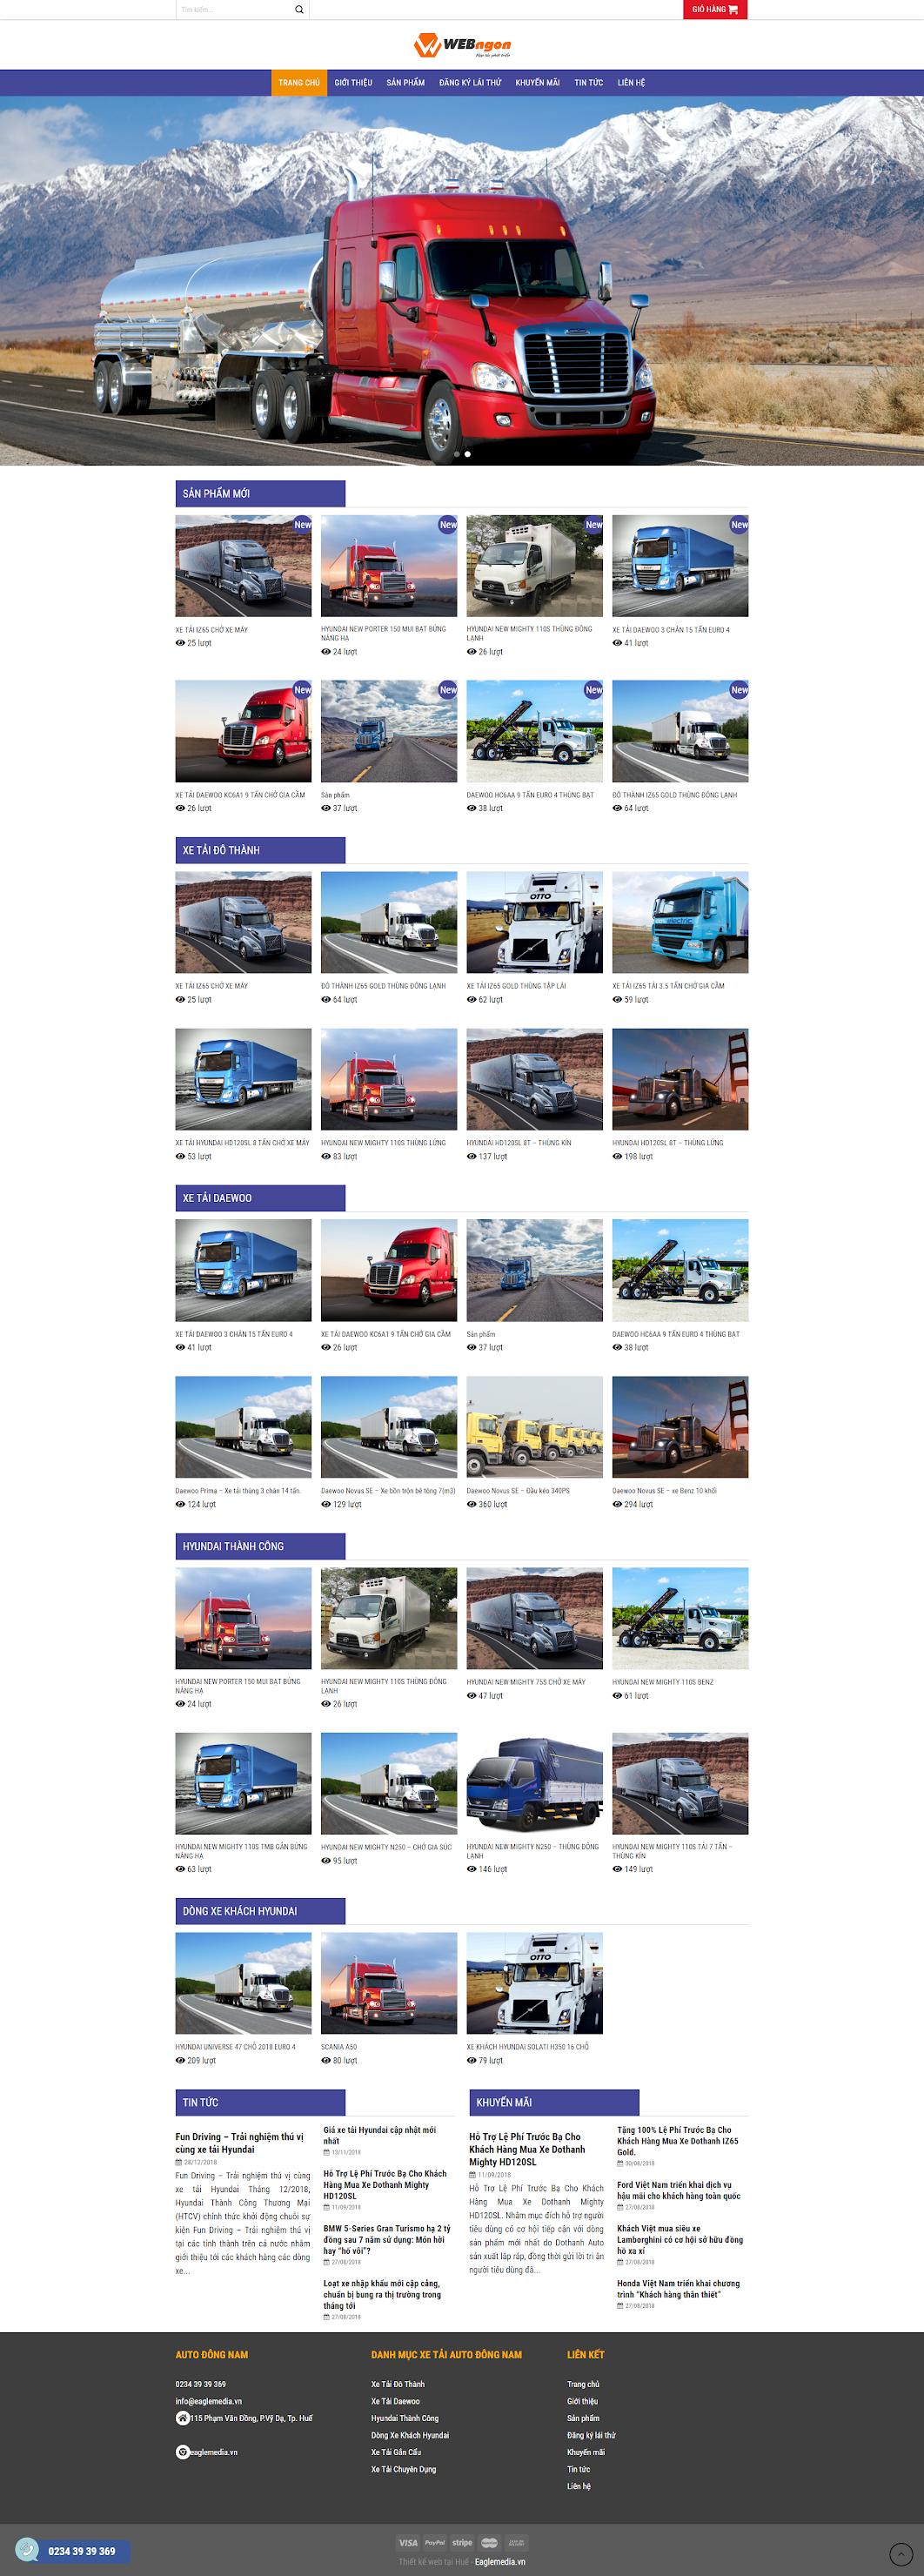 mẫu xe tải wn024